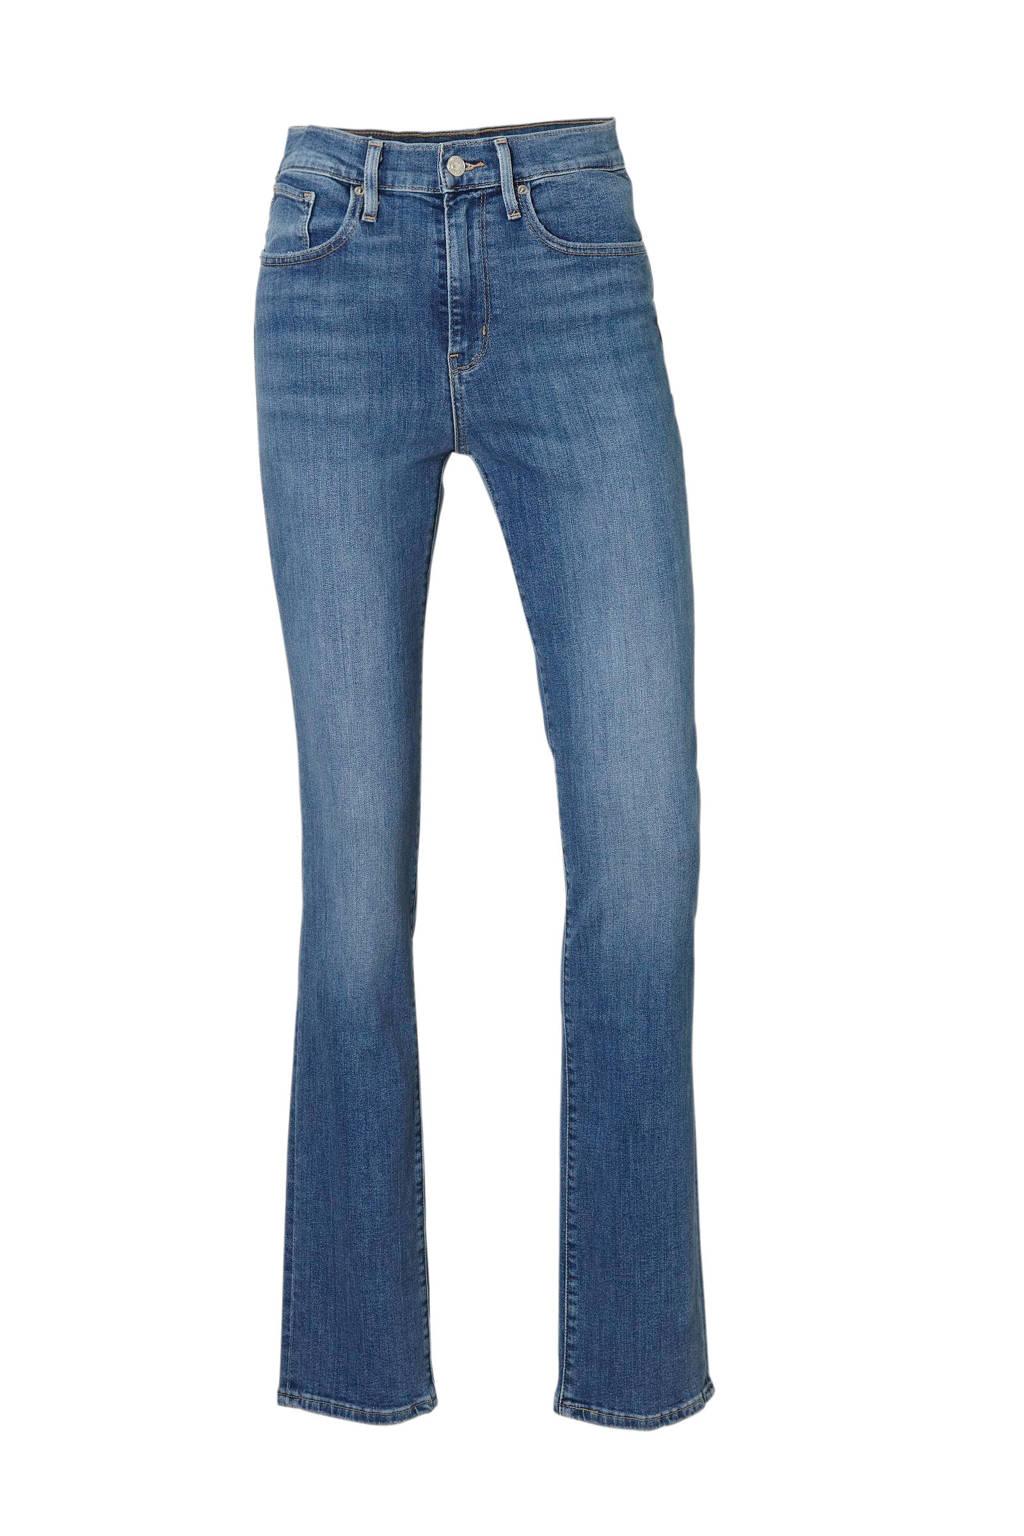 Levi's high waist straight fit jeans blauw, Blauw